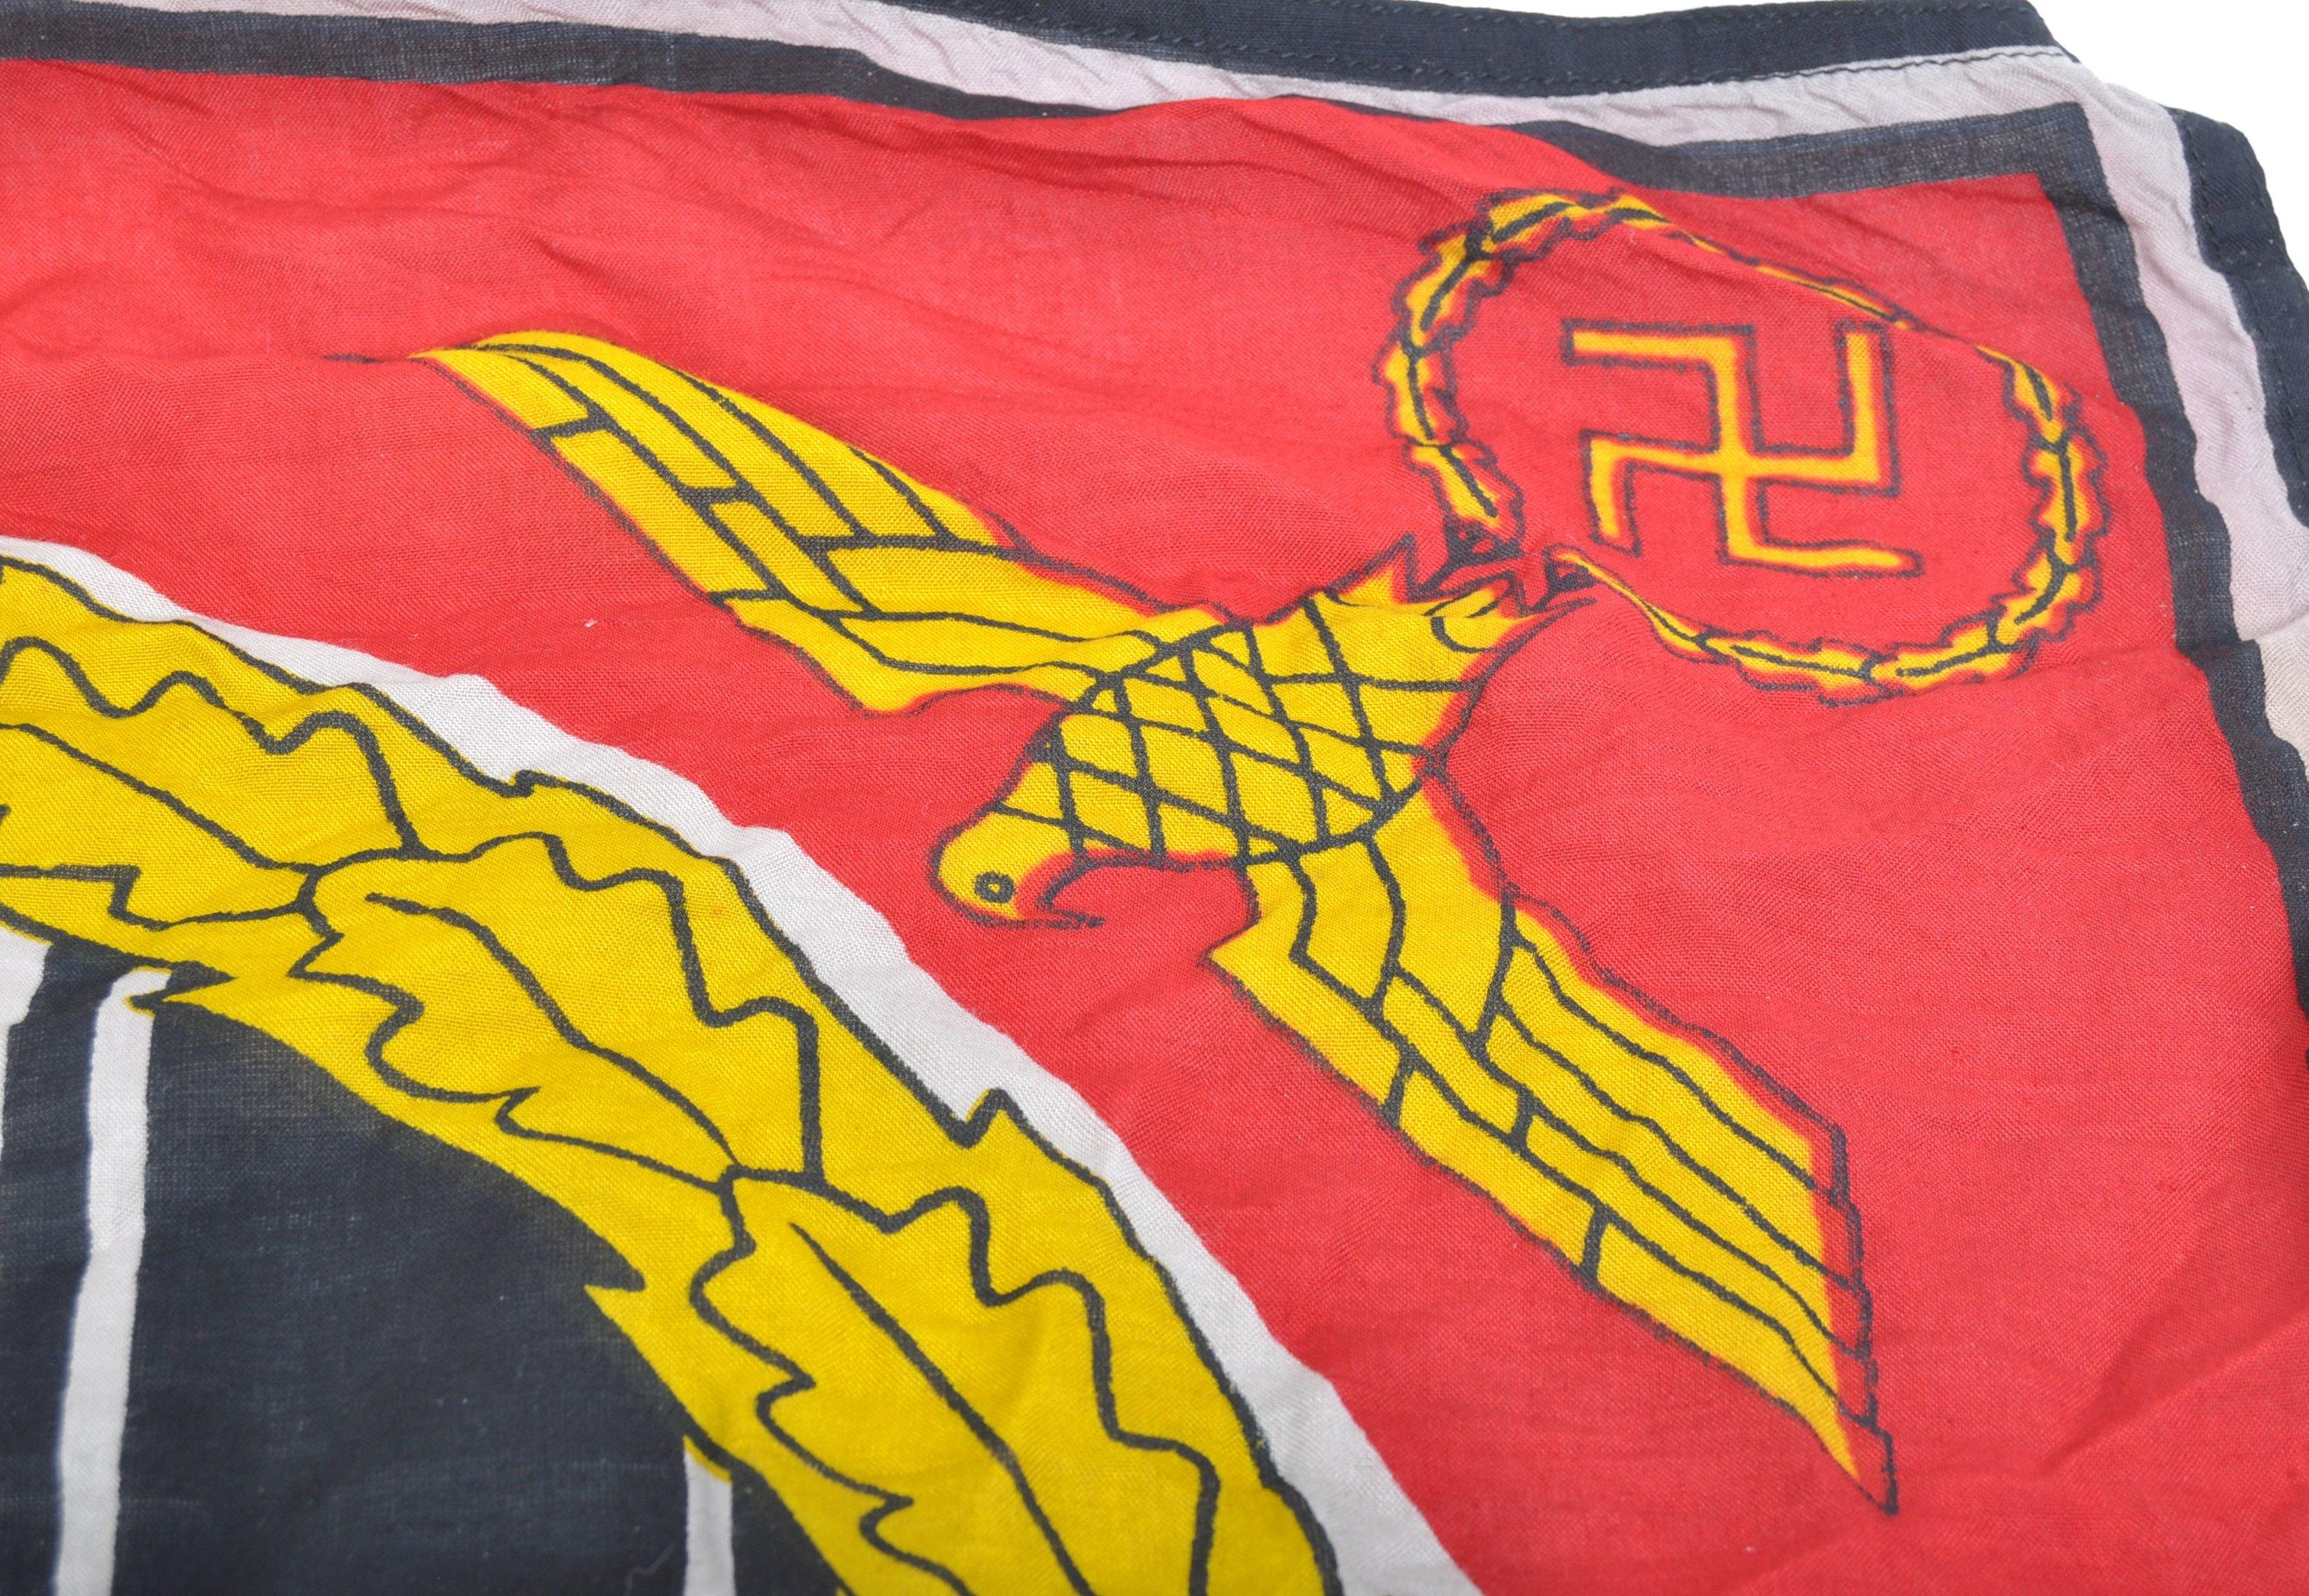 WWII SECOND WORLD WAR FUHRER STANDARD LINEN FLAG - Image 5 of 6